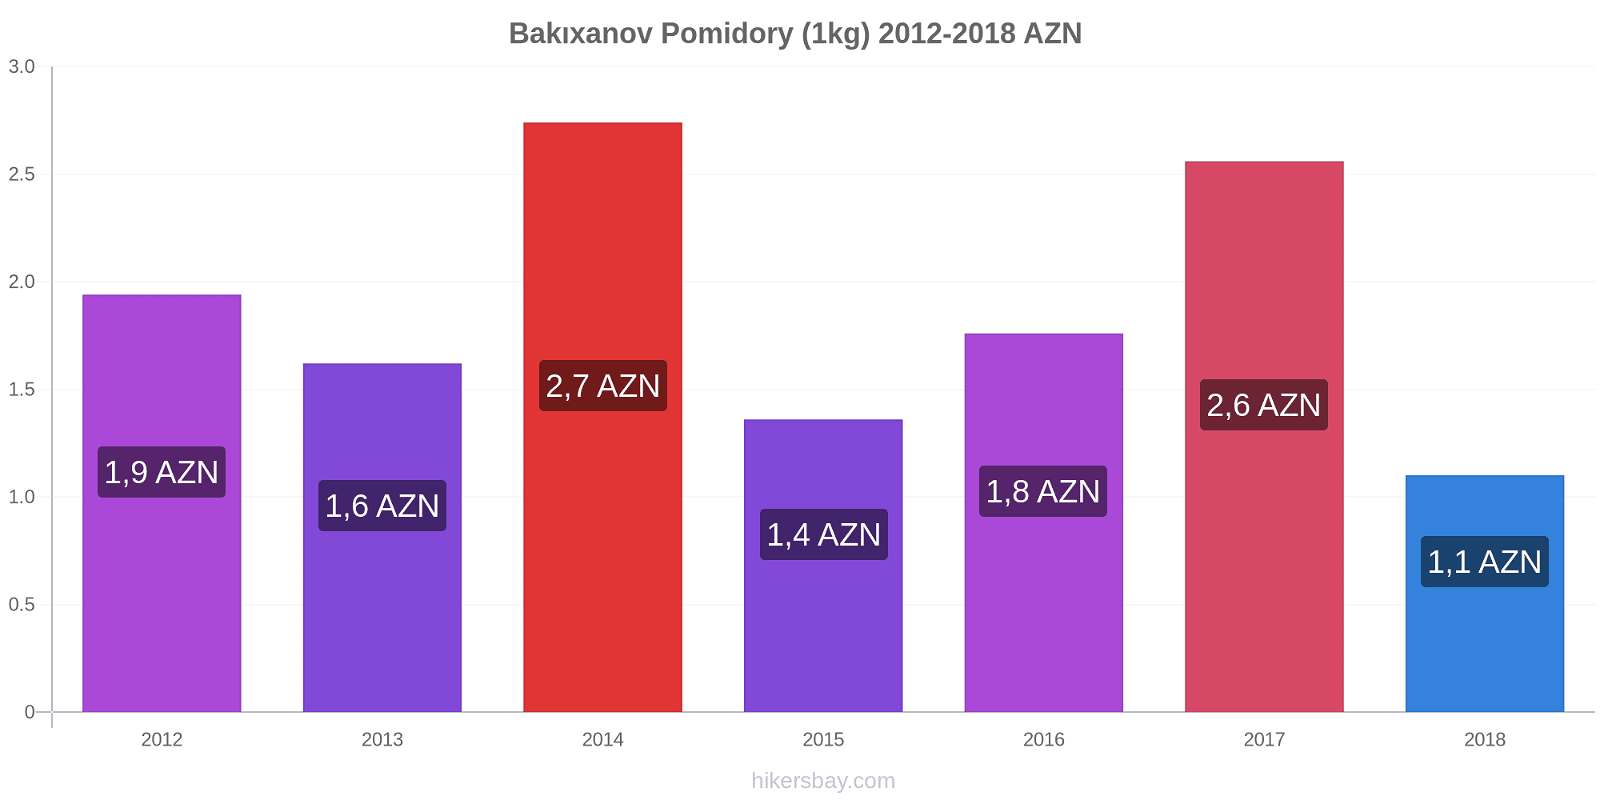 Bakıxanov zmiany cen Pomidory (1kg) hikersbay.com